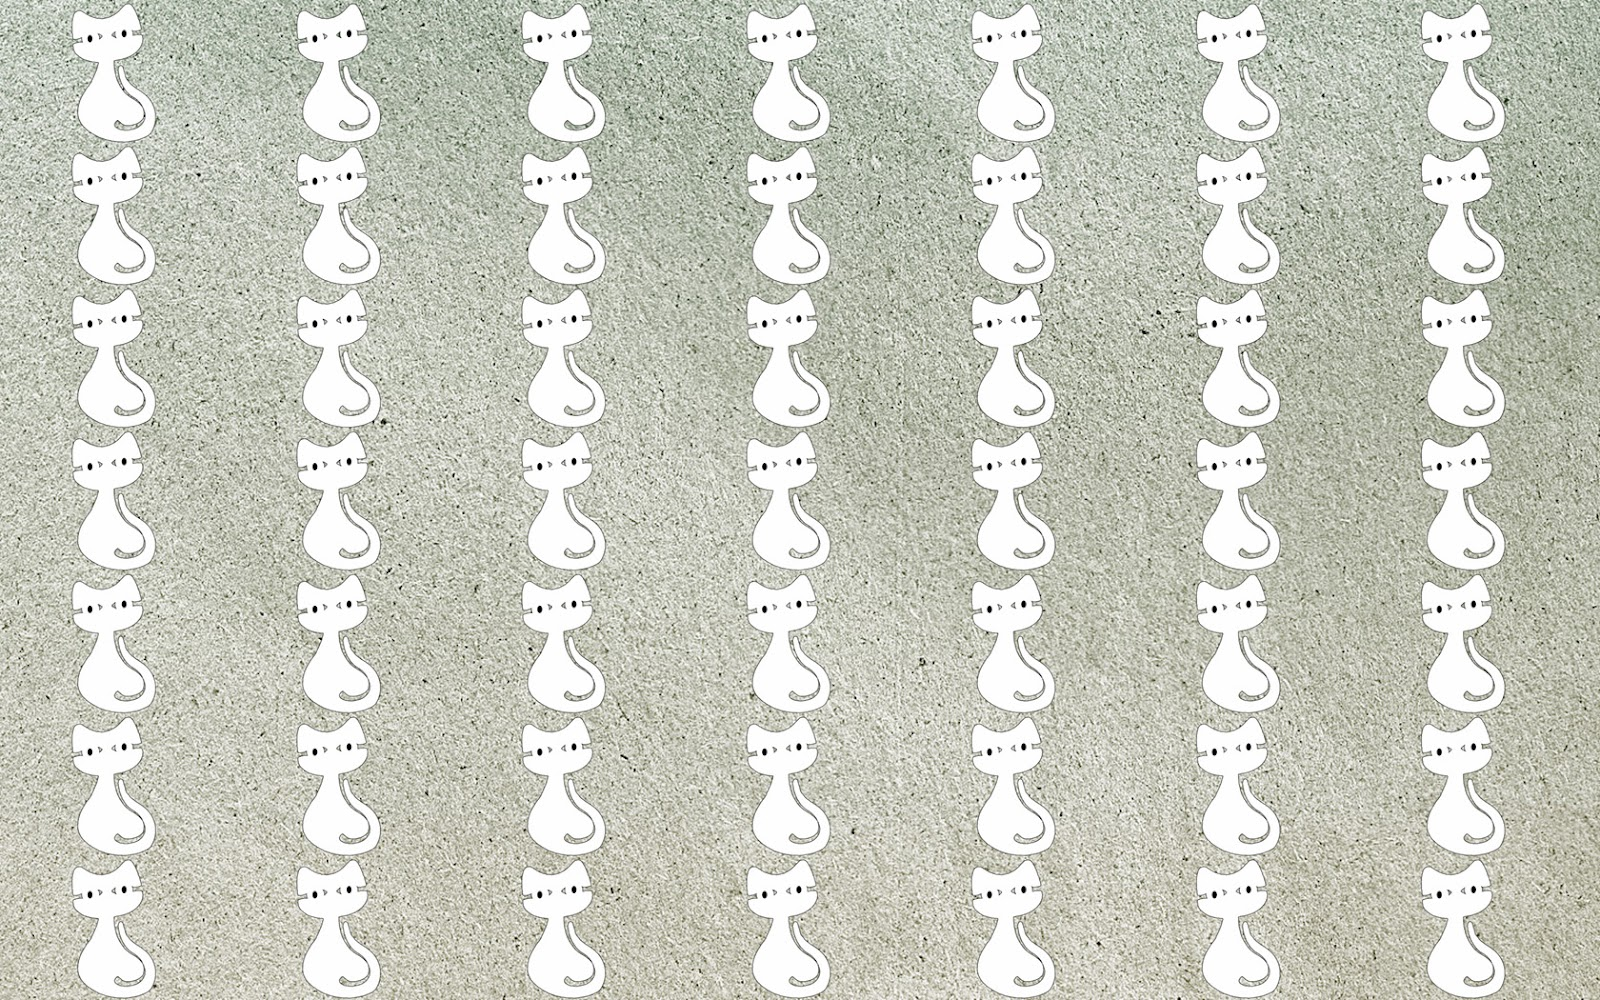 Sitting white cat tumblr background